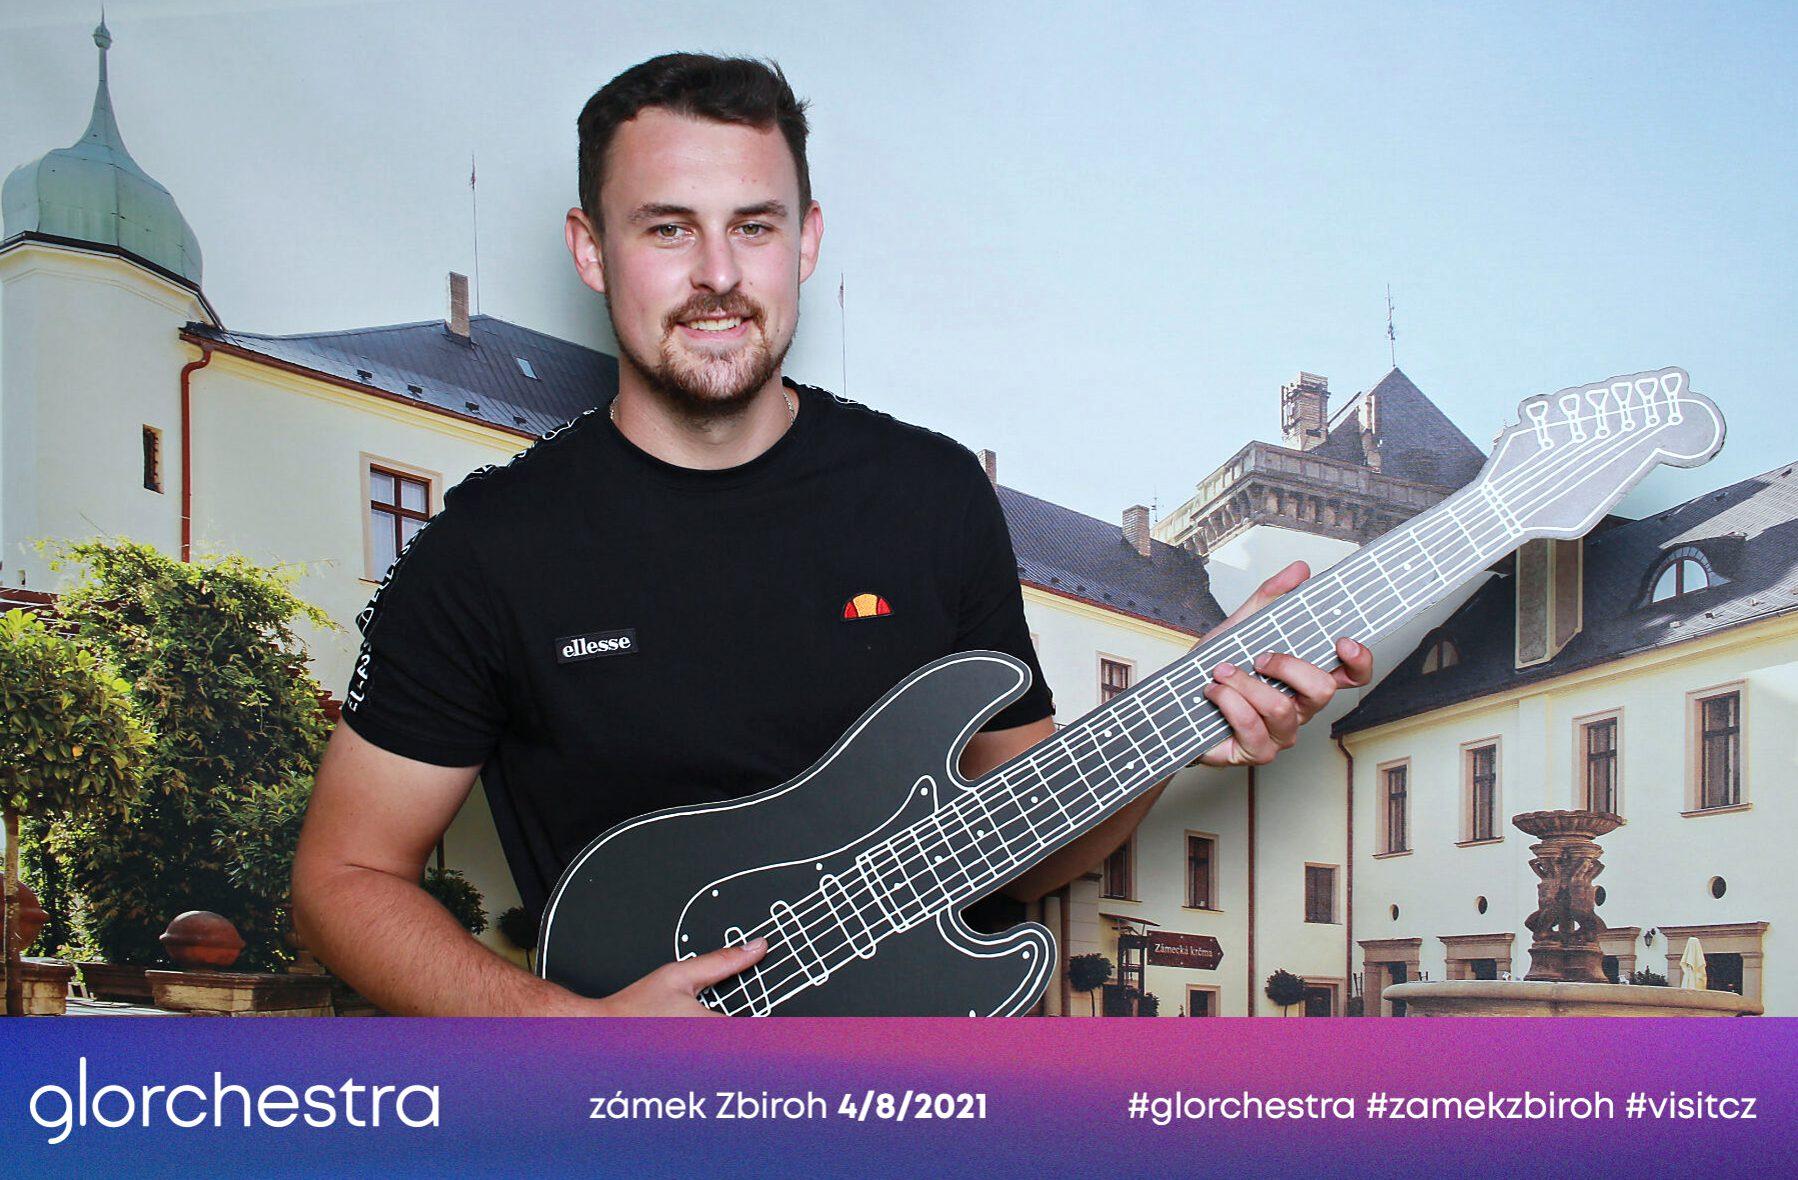 fotokoutek-glorchestra-4-8-2021-740140